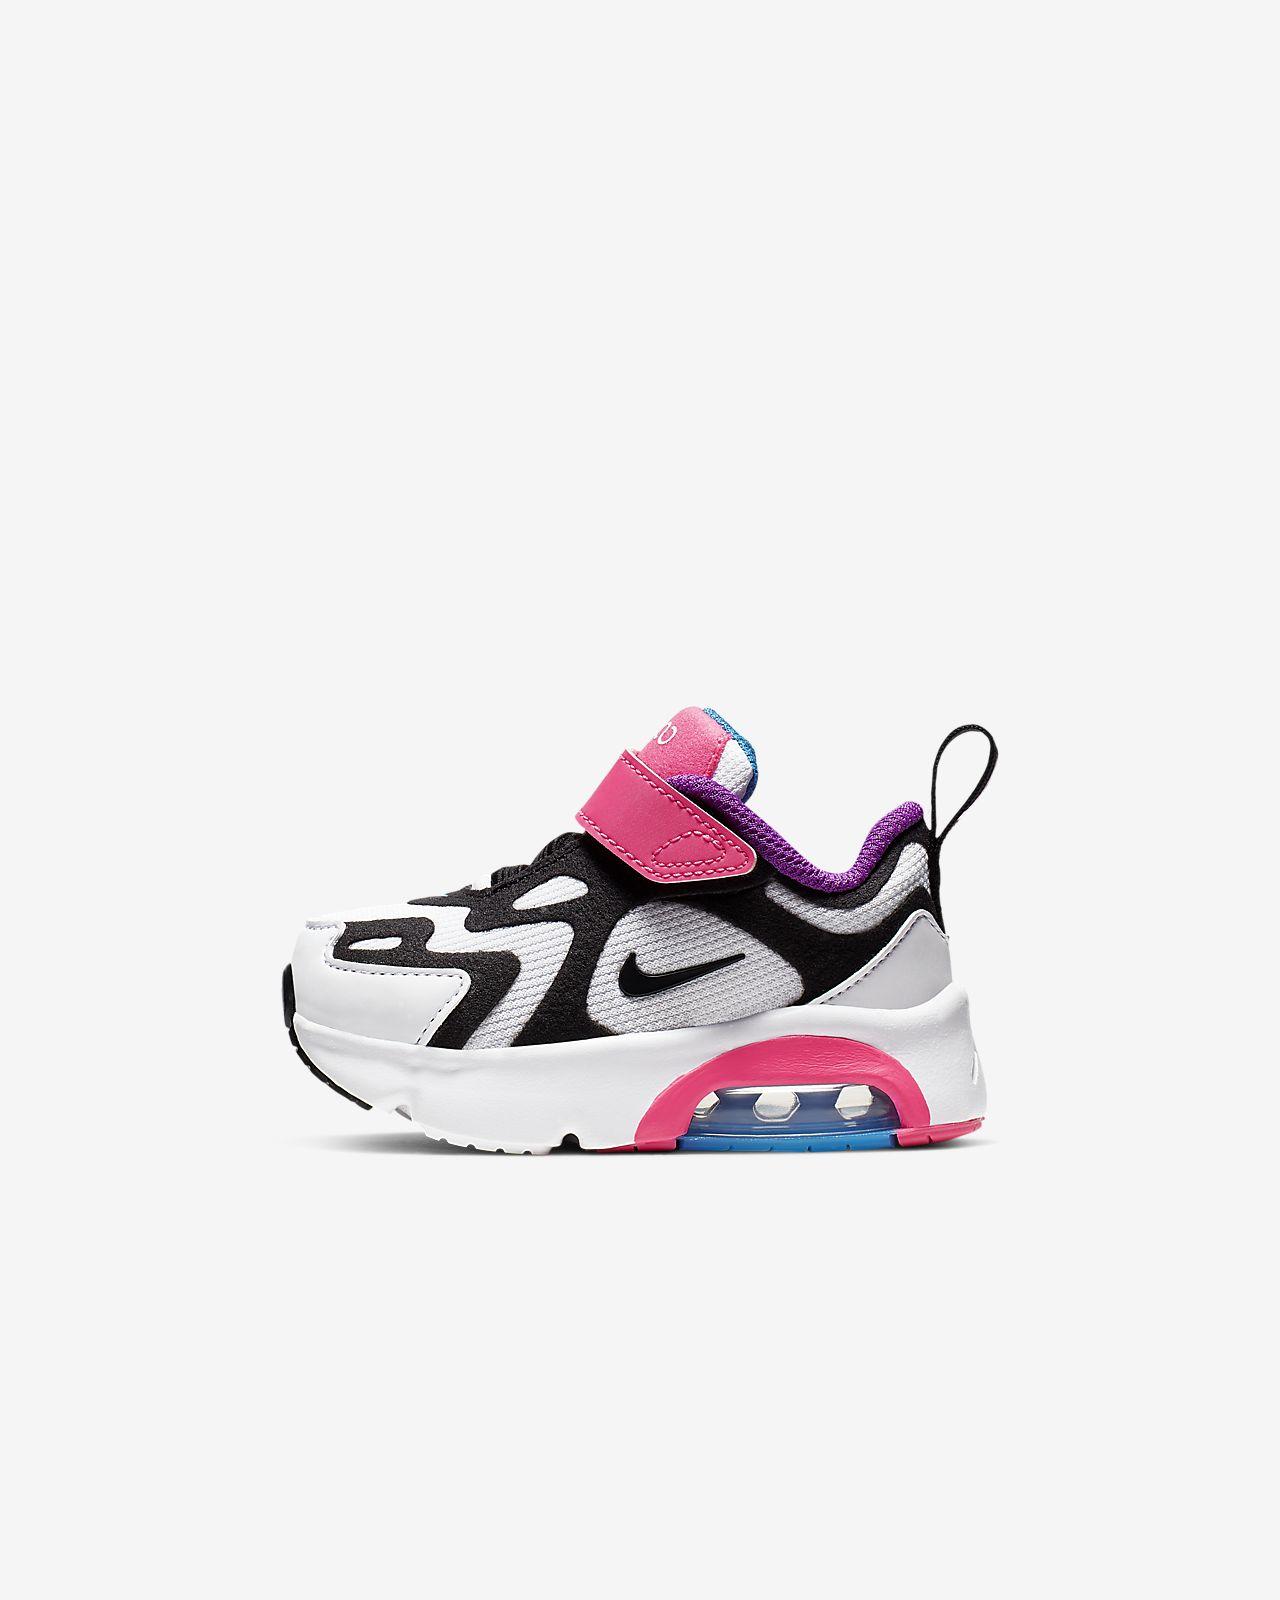 Nike Air Max 200 Infant/Toddler Shoe